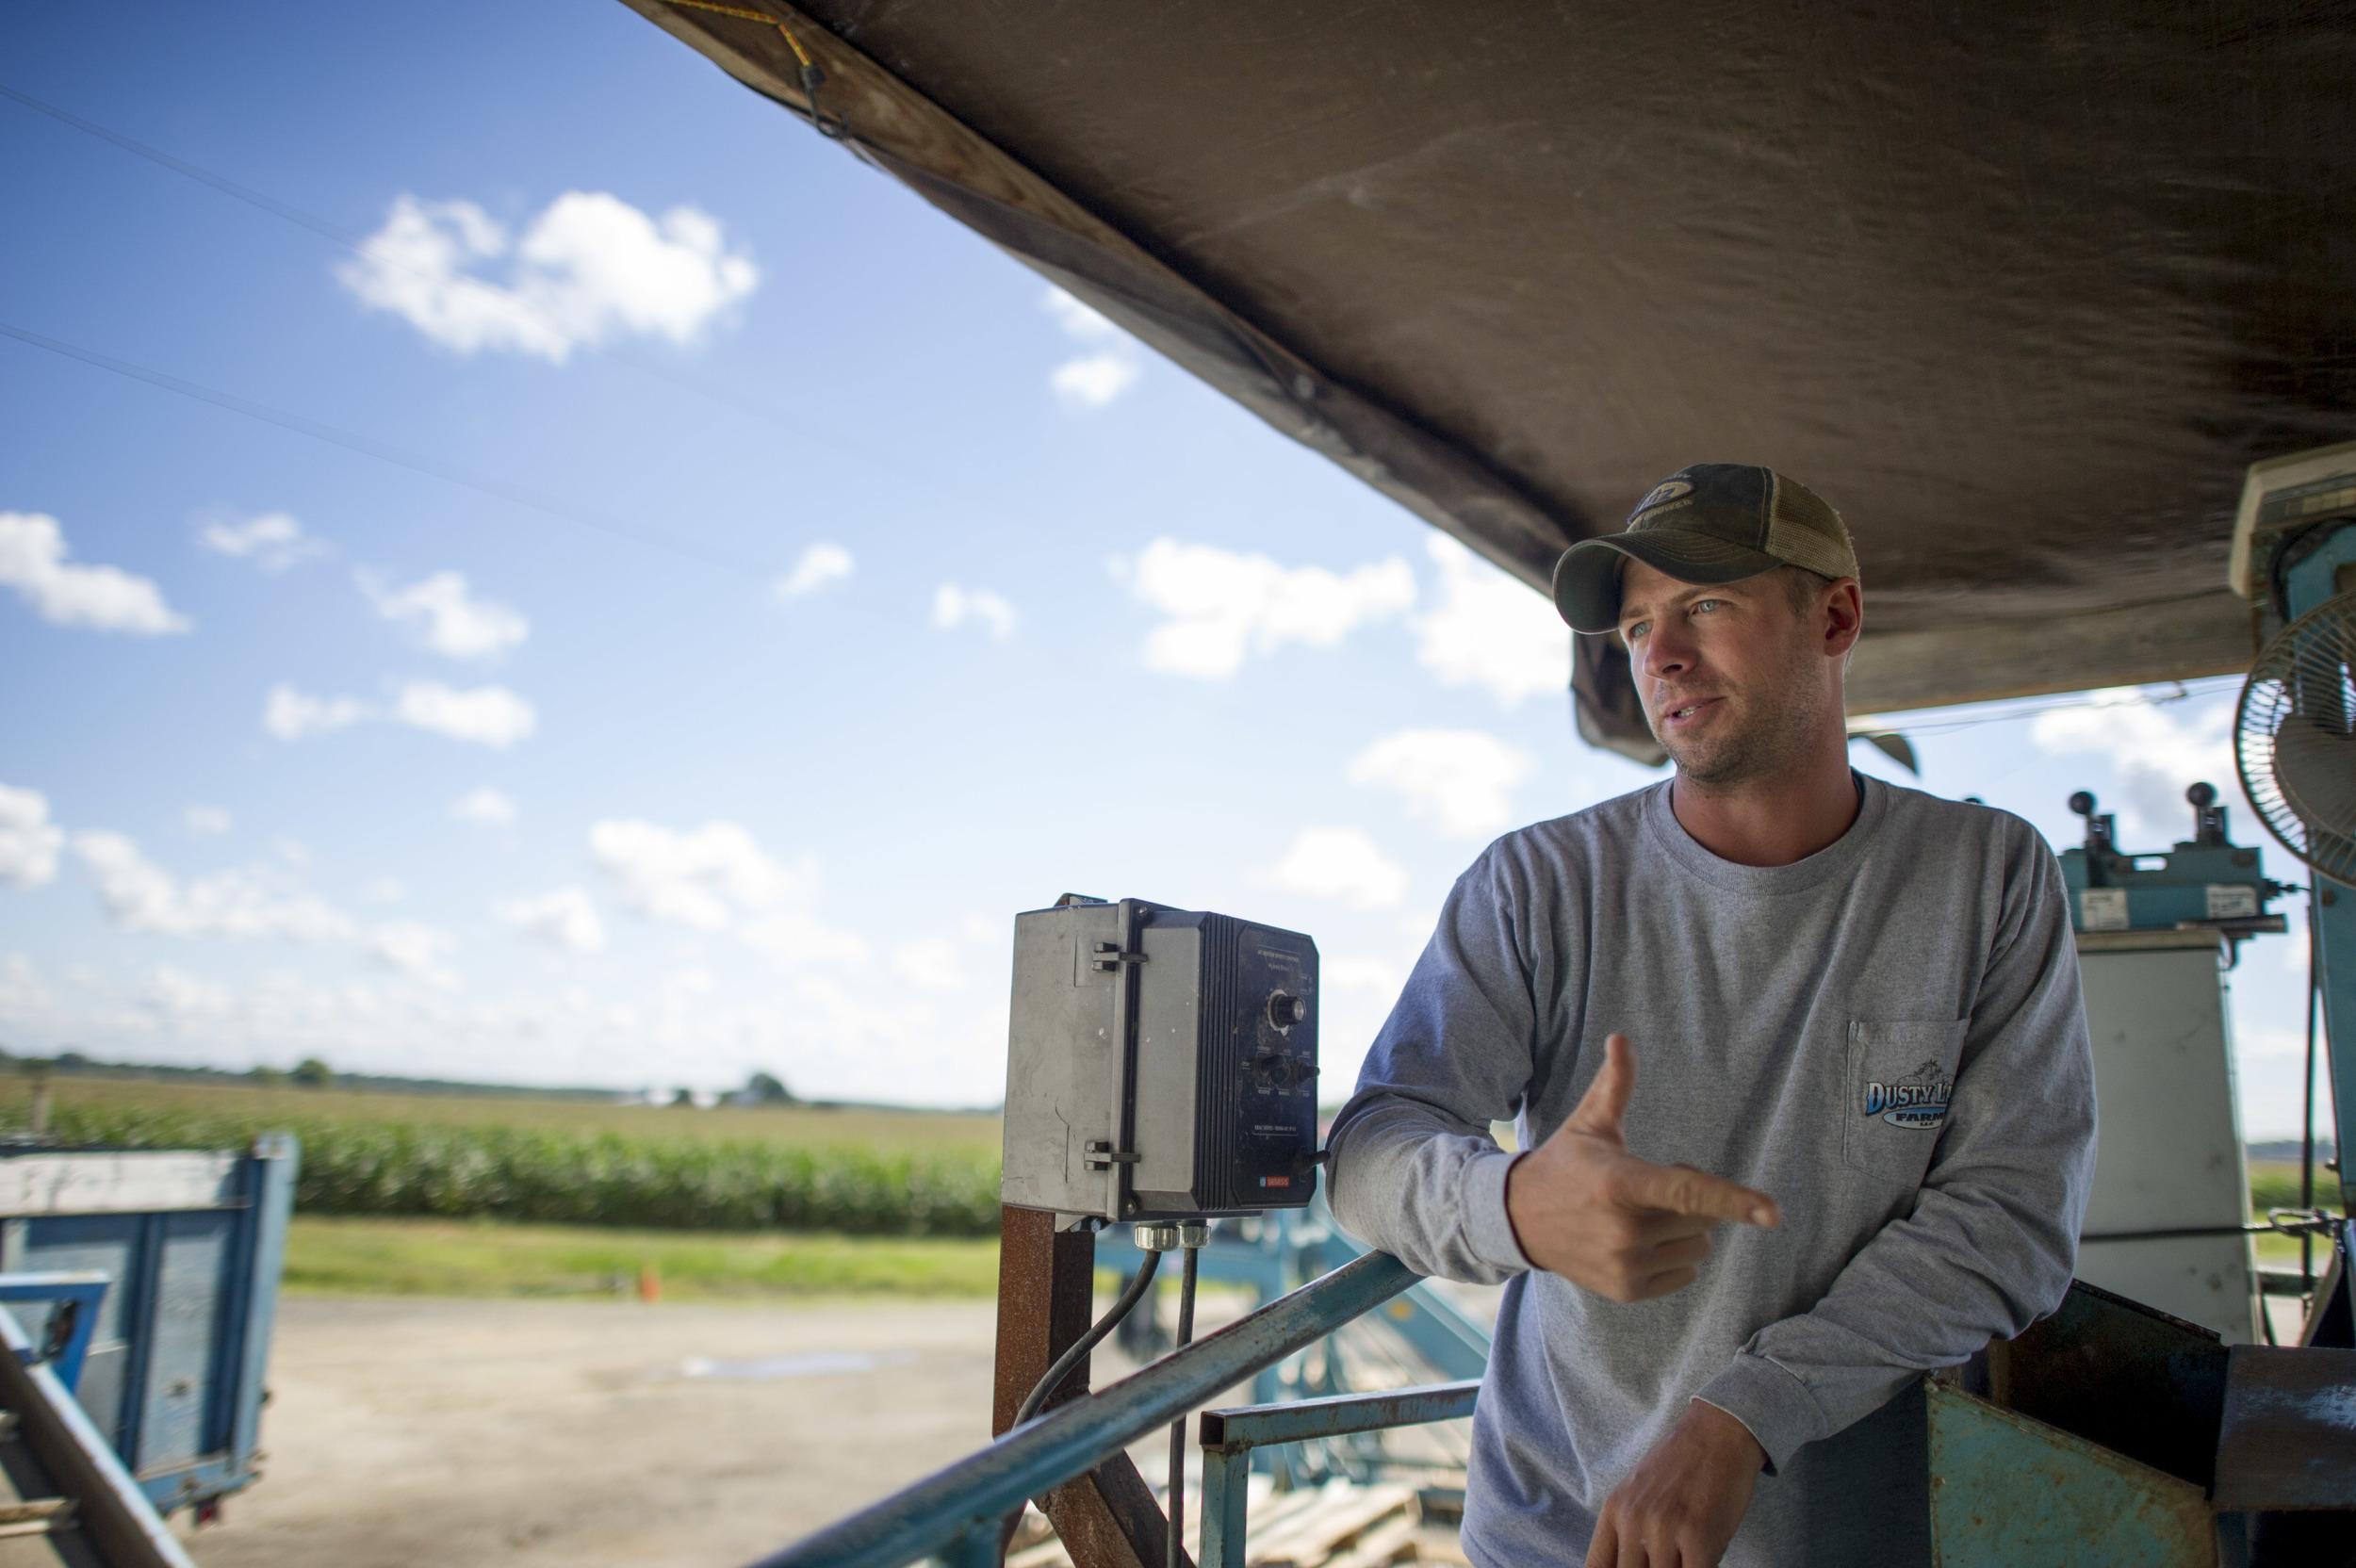 Michael overlooking the potato harvester.